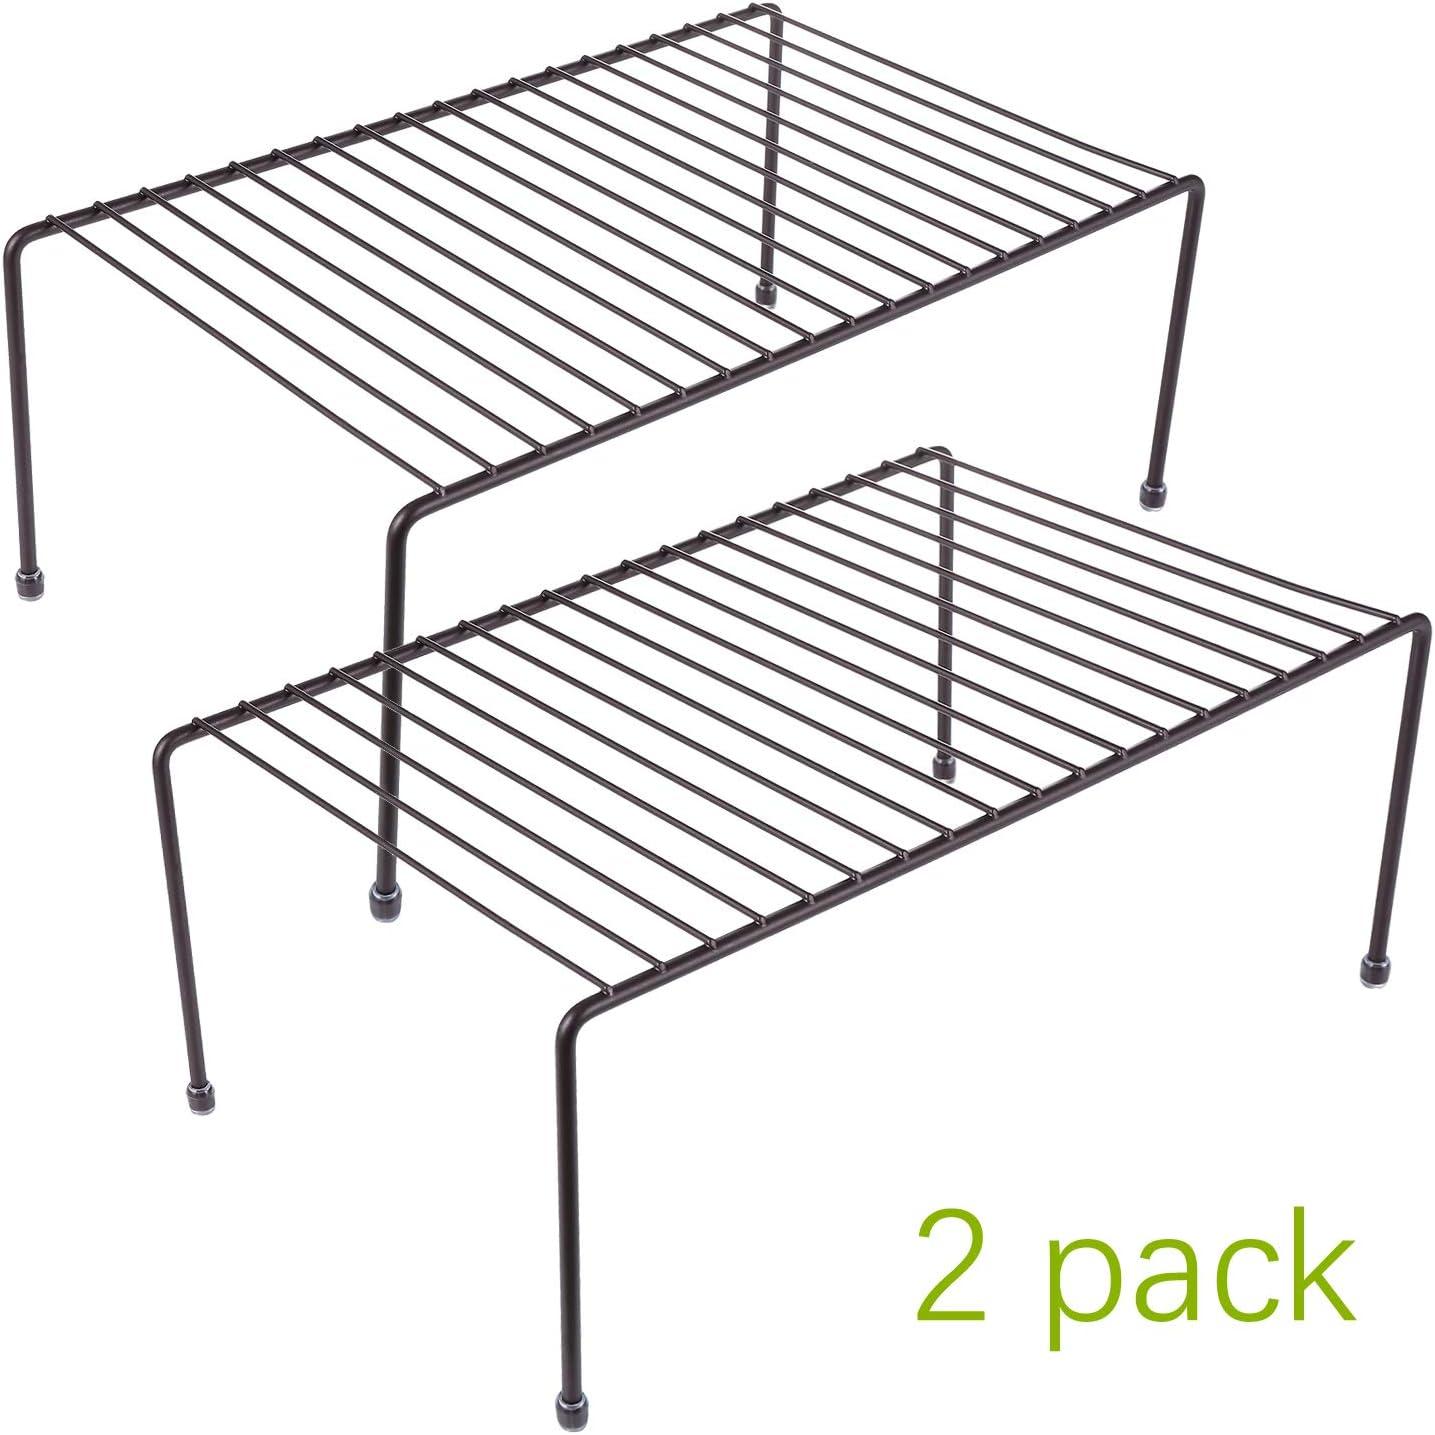 2 Pack - Kitchen Storage Shelf Rack w/Plastic Feet - Medium - Steel Metal - Rust Resistant Finish - Cups, Dishes, Cabinet & Pantry Organization [Bronze]